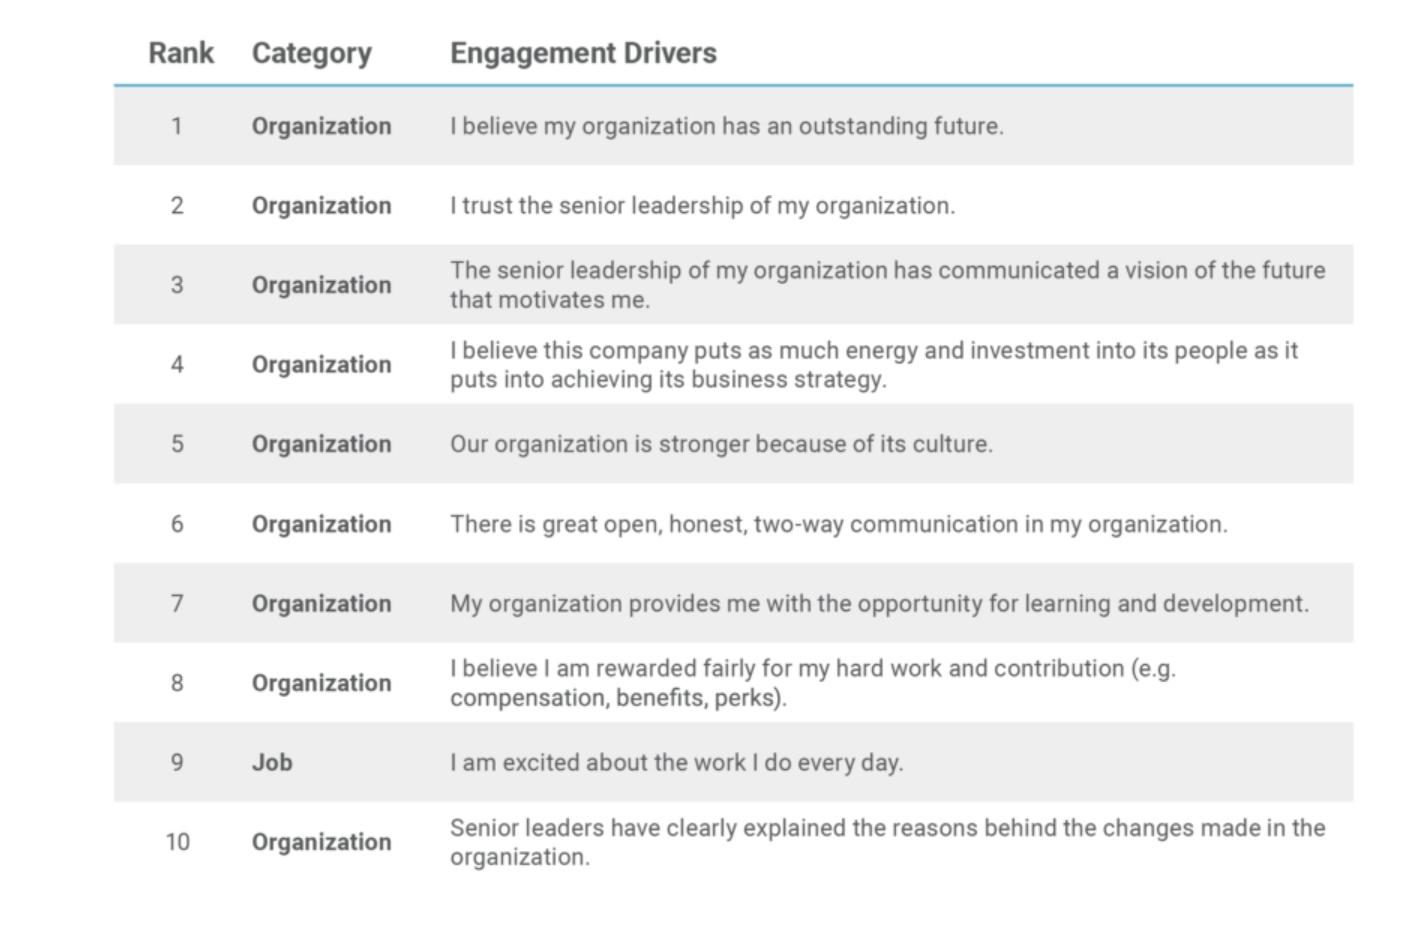 company culture drives engagement